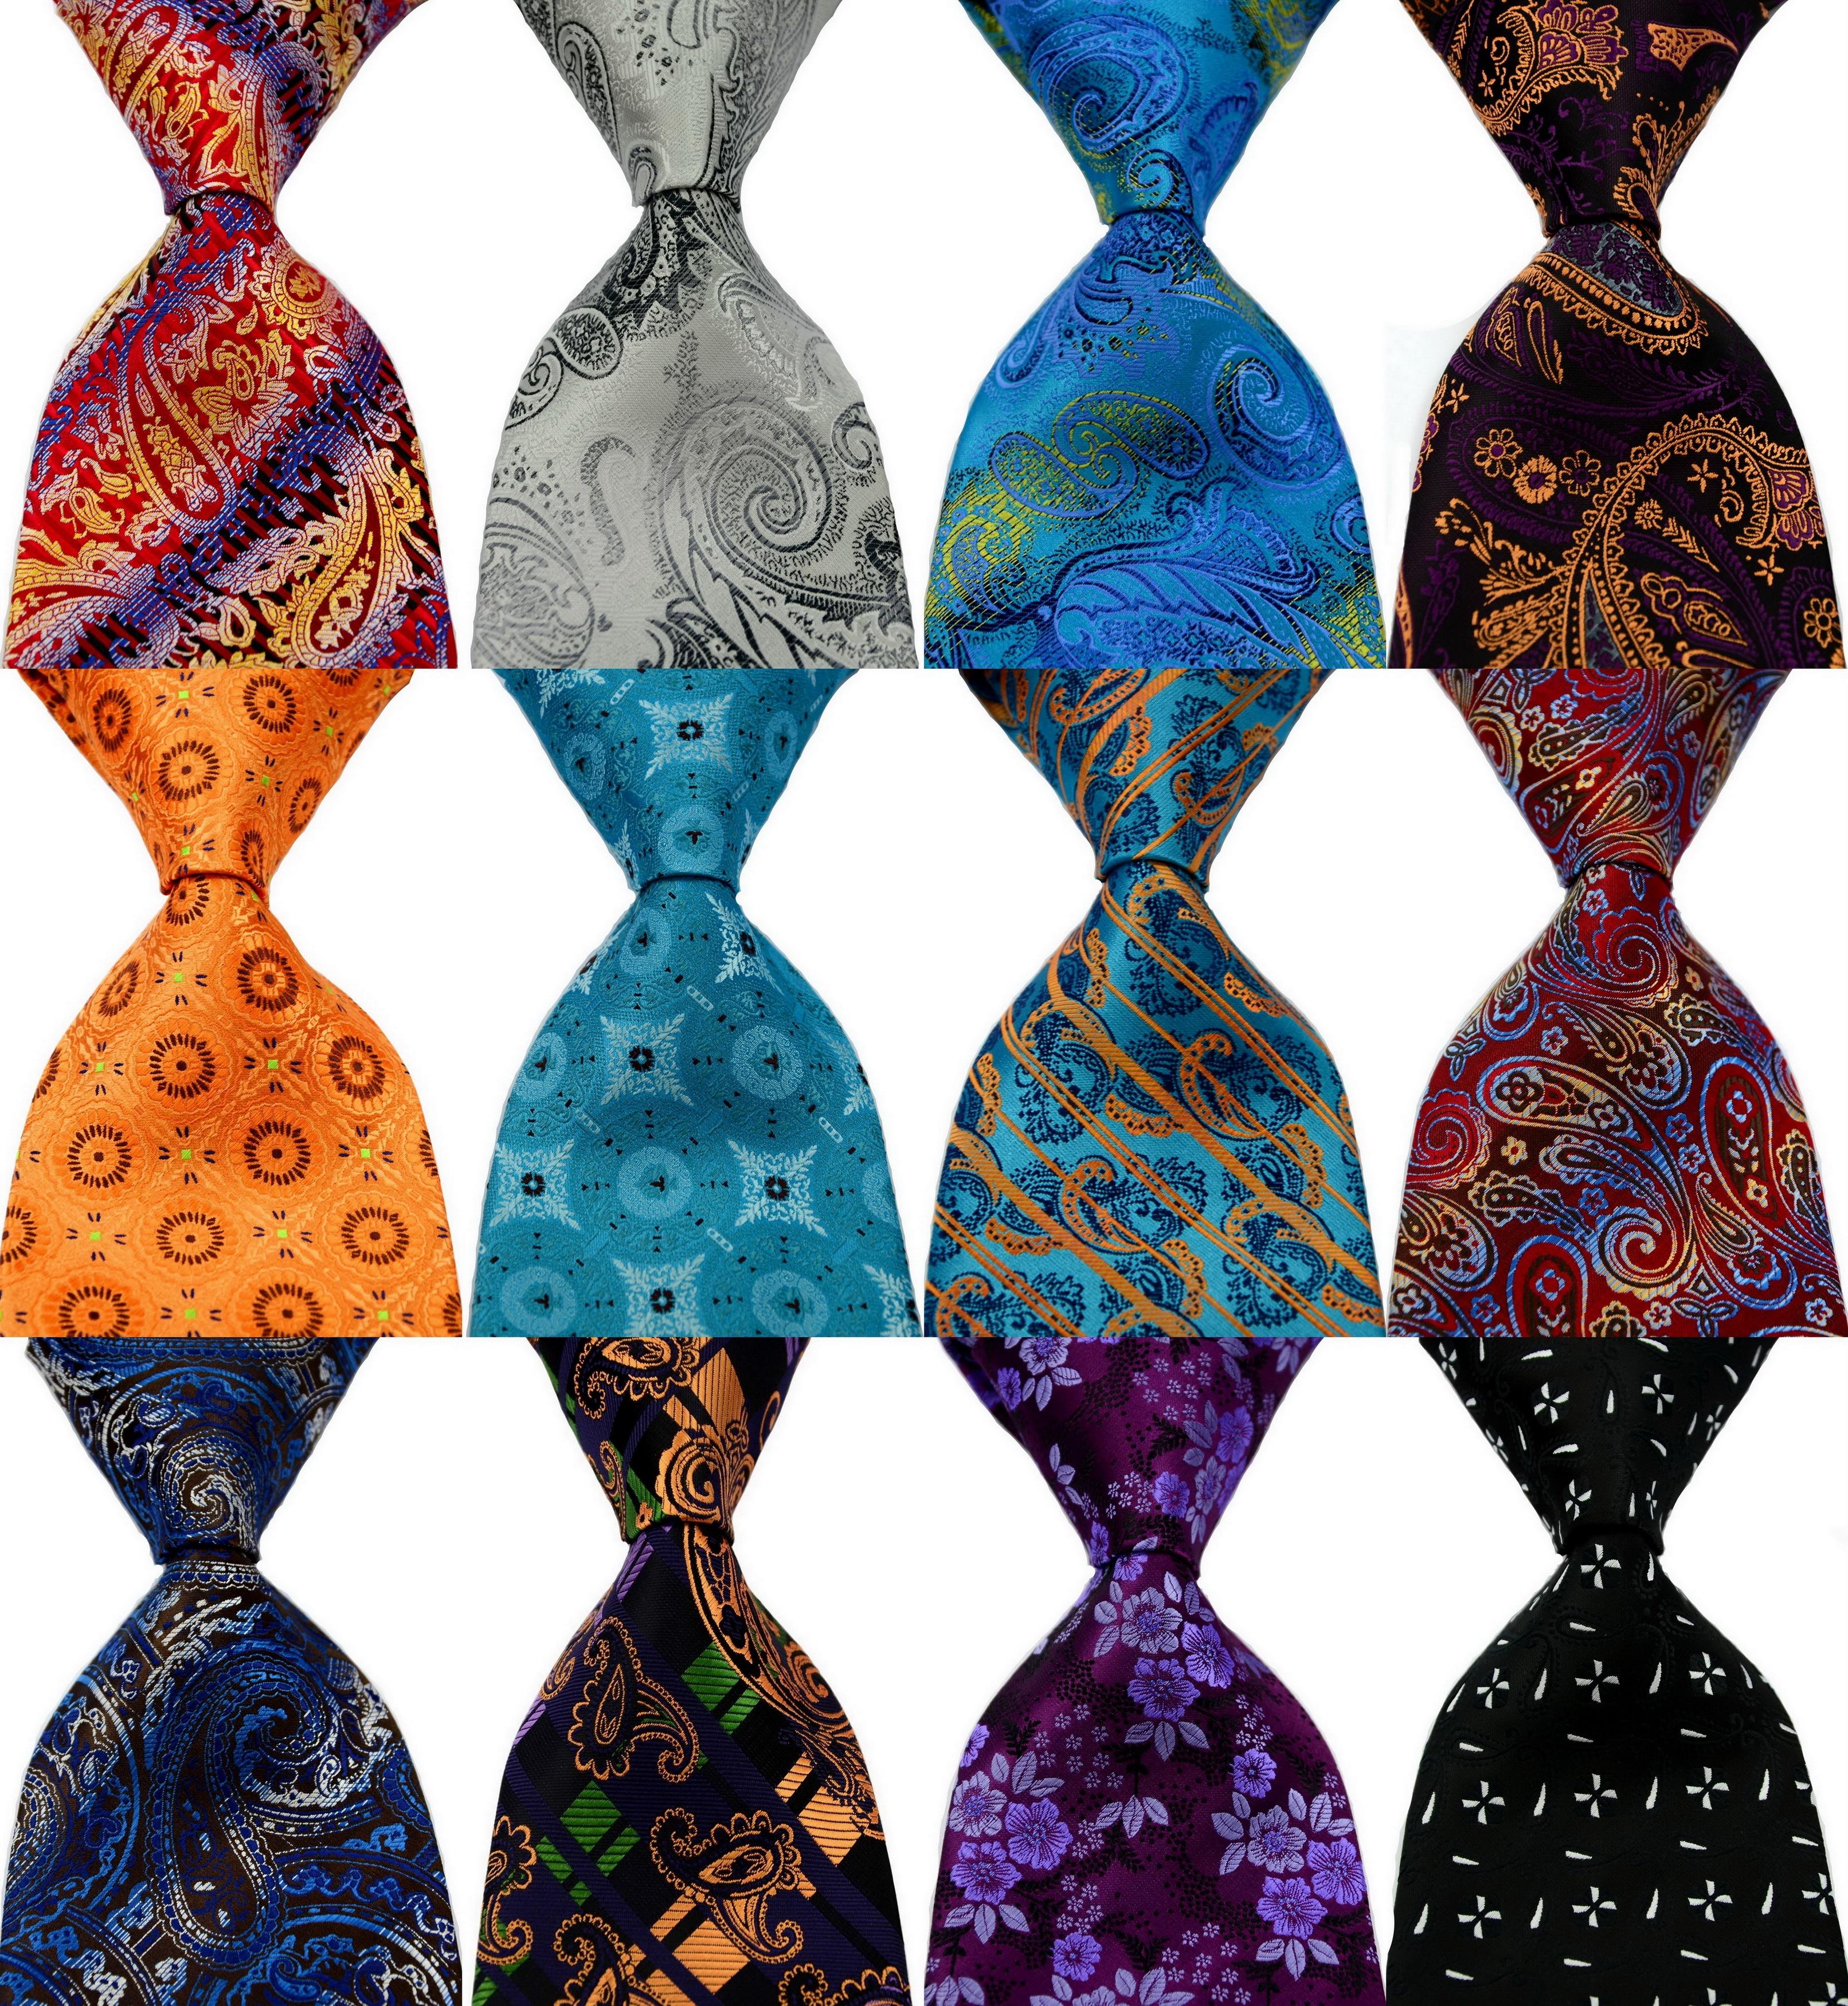 Men's Floral Tie 100% Silk Paisley Gray Purple Jacquard Party Wedding Woven Fashion Design Necktie